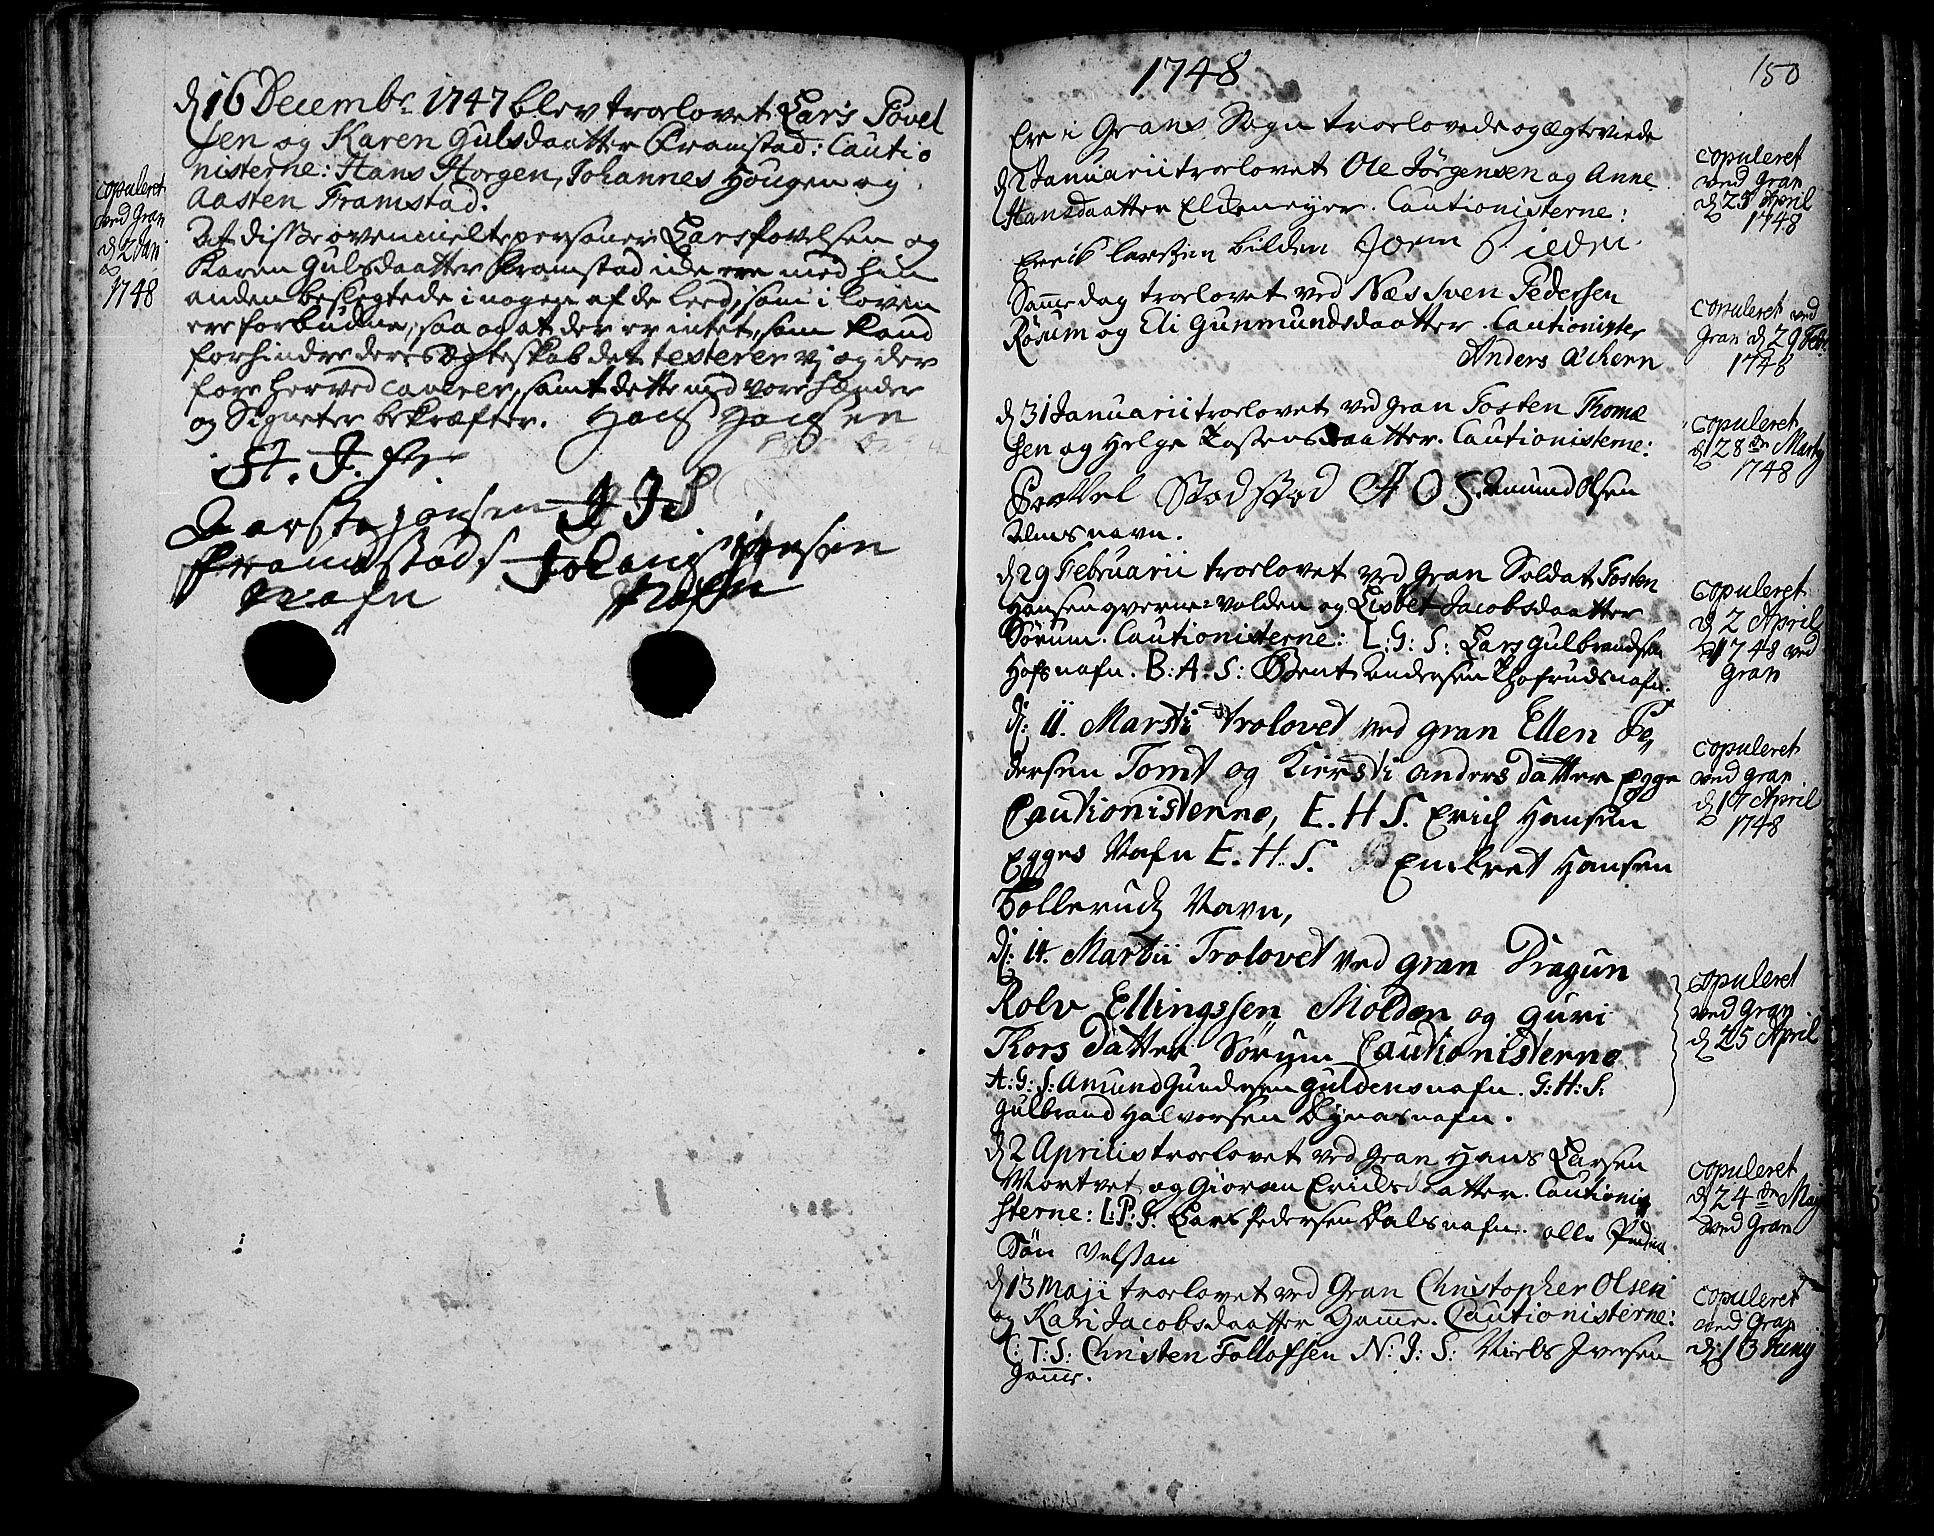 SAH, Gran prestekontor, Ministerialbok nr. 3, 1745-1758, s. 150